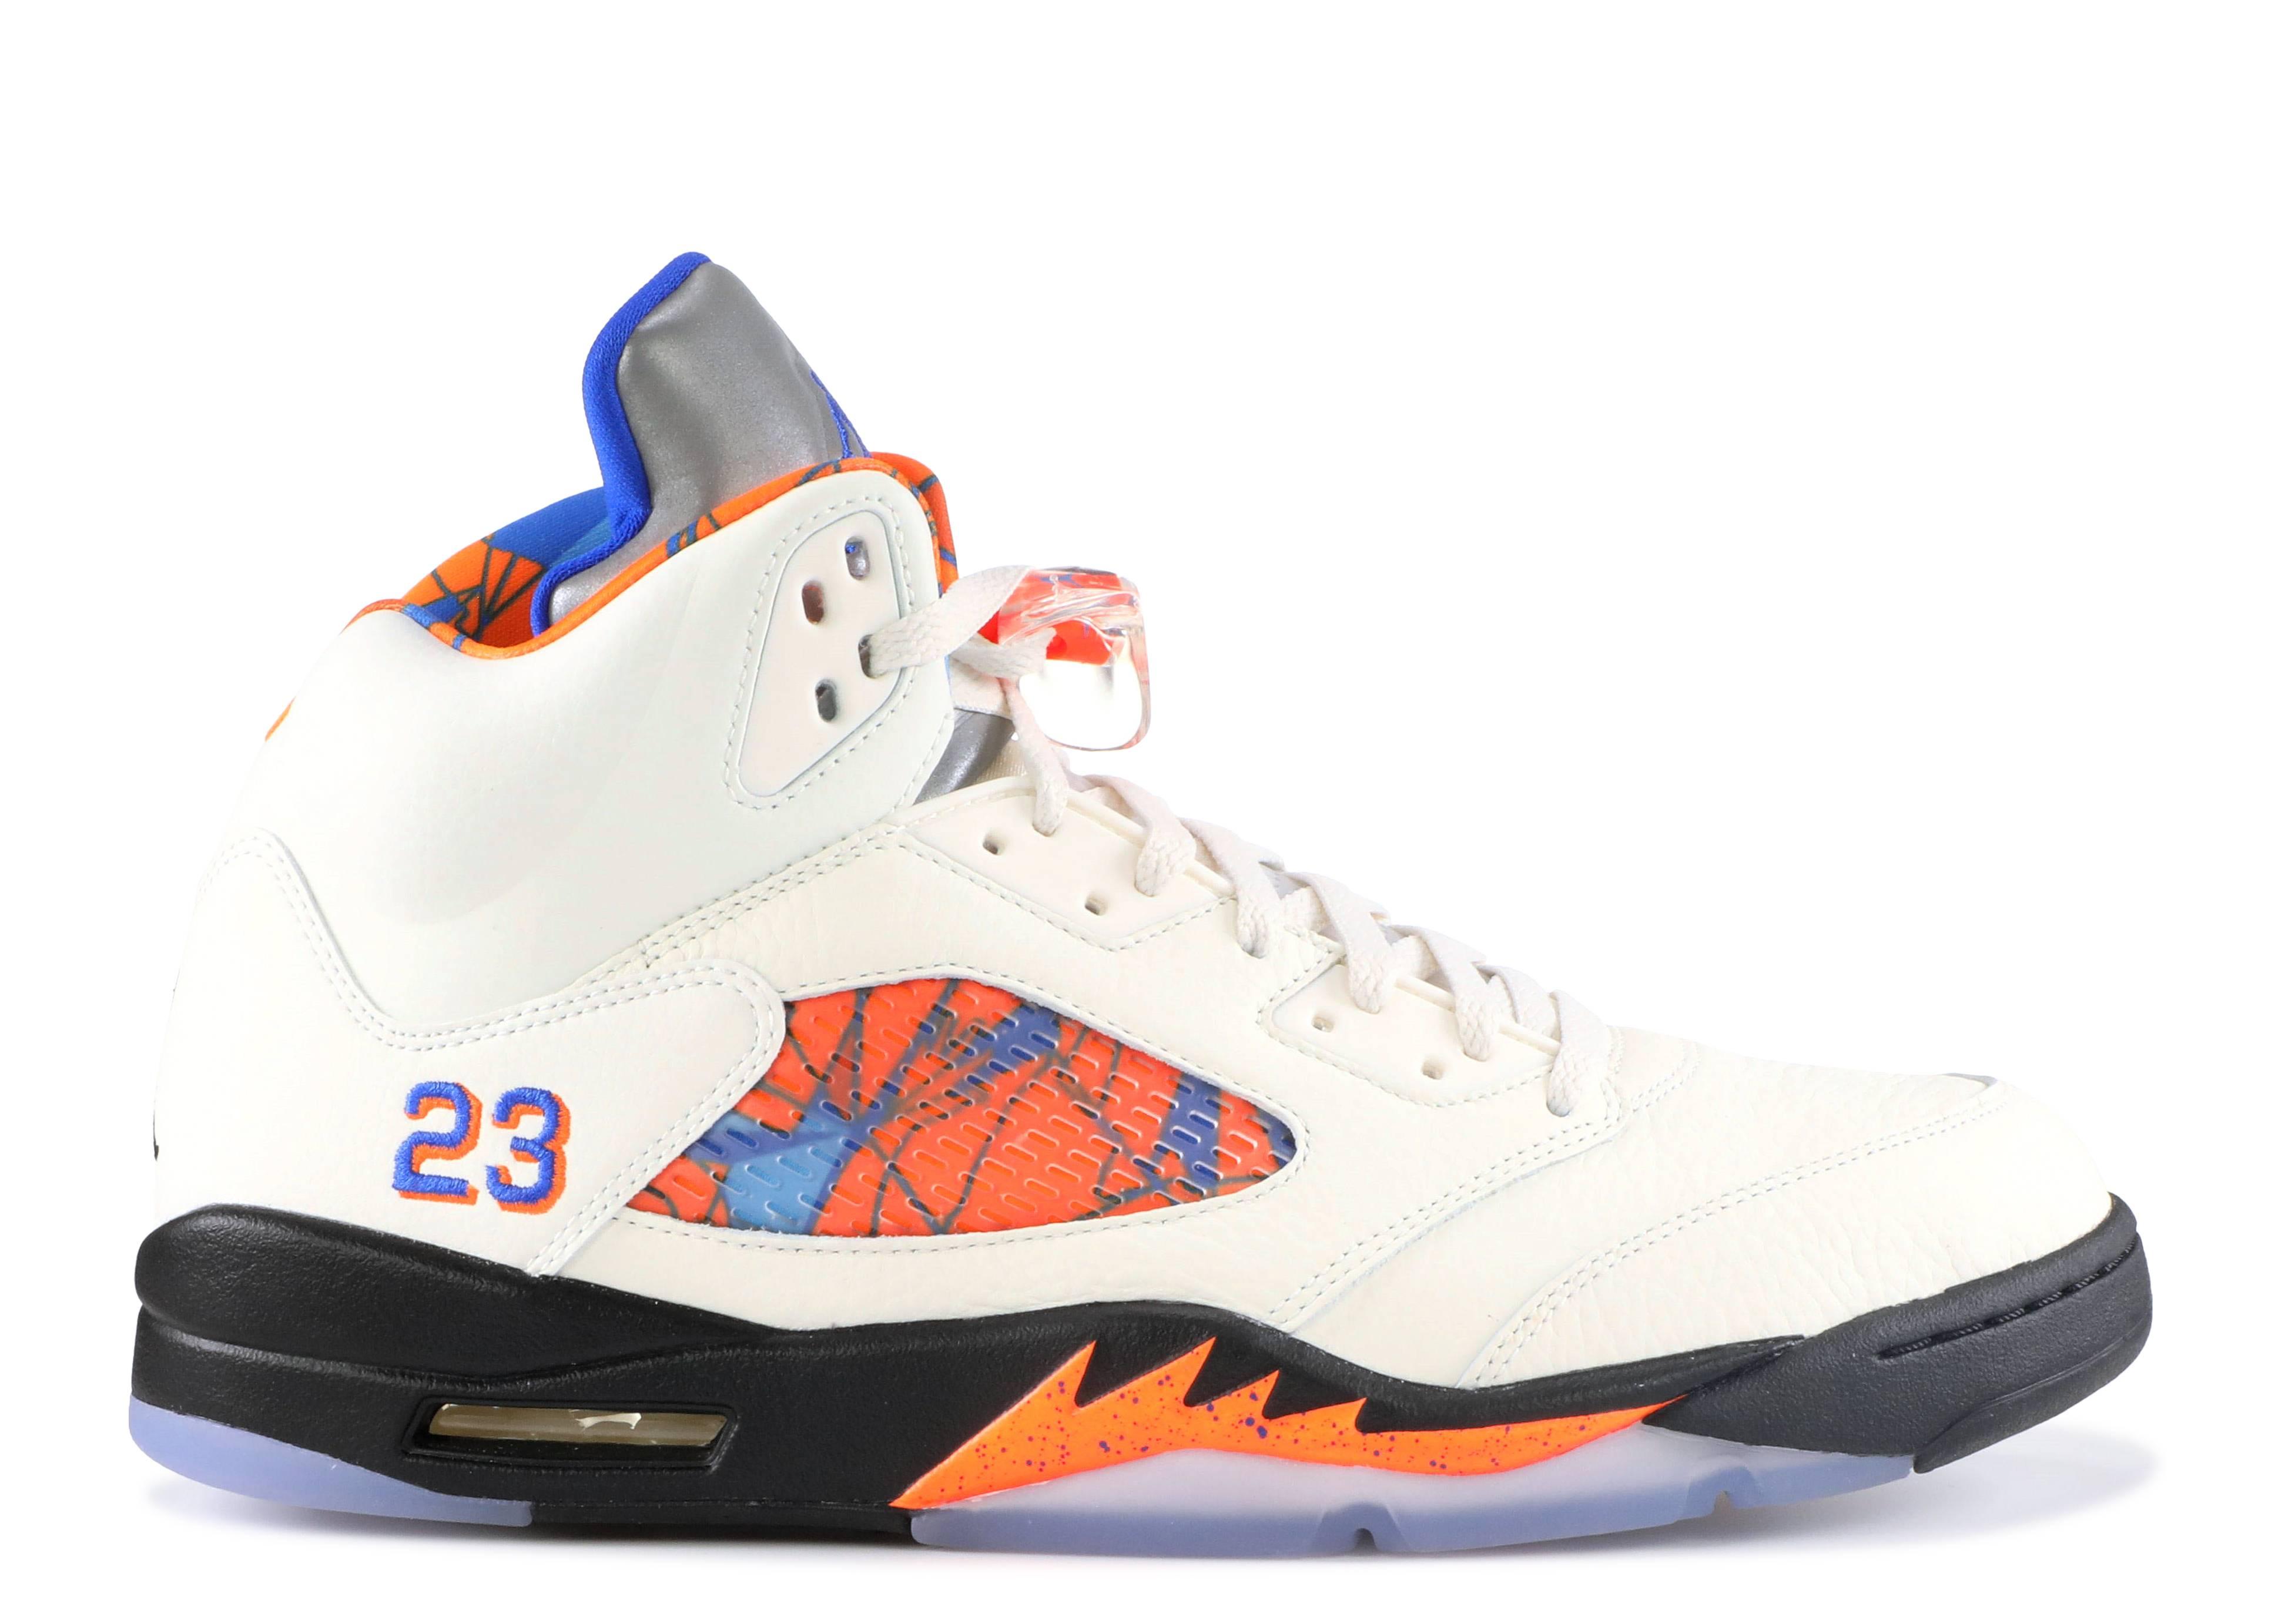 6dc6180a26653 Air Jordan 5 Retro